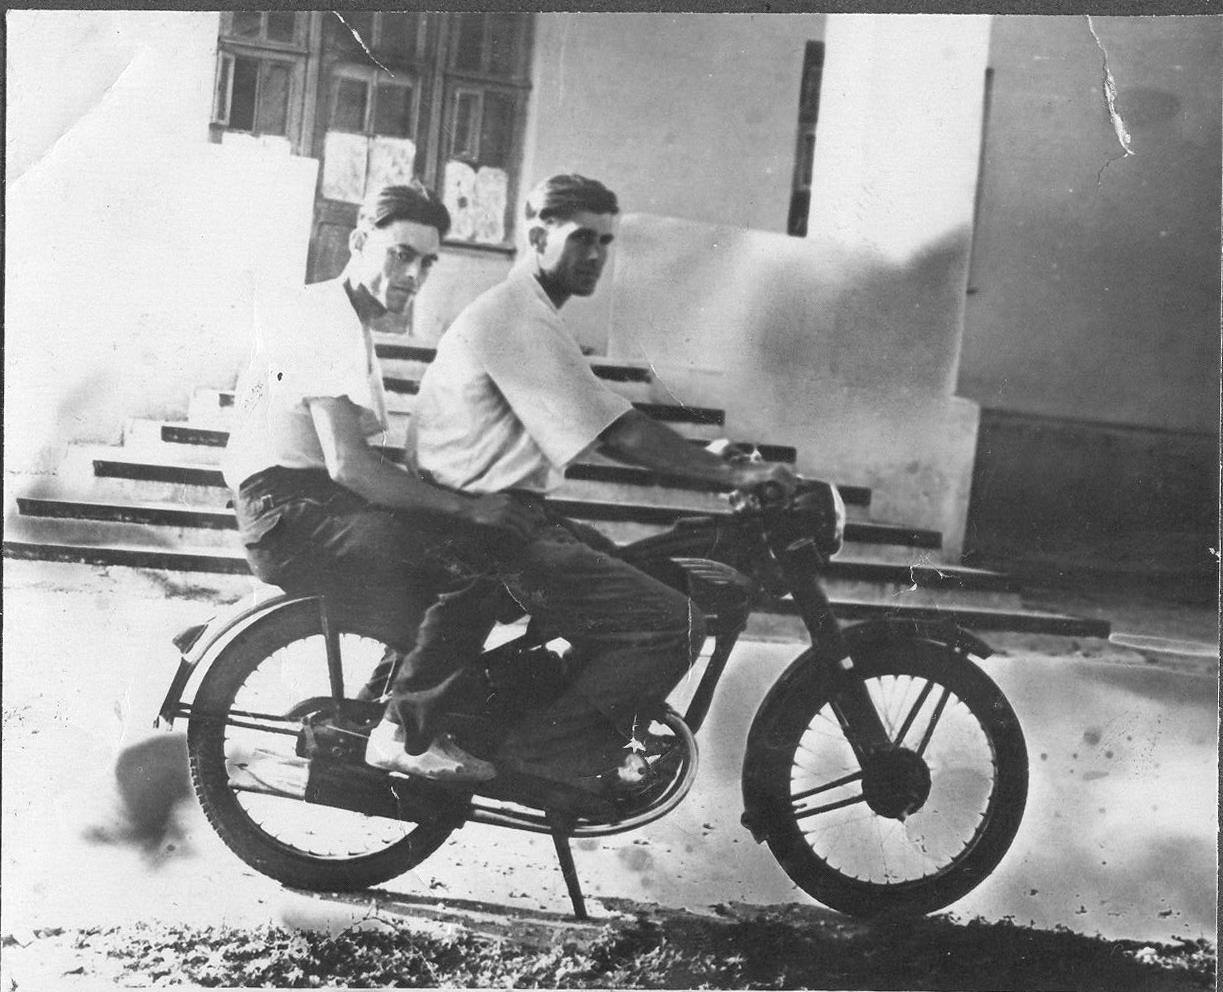 1960-е. Казахстан, Павлодарская обл. Сберкасса